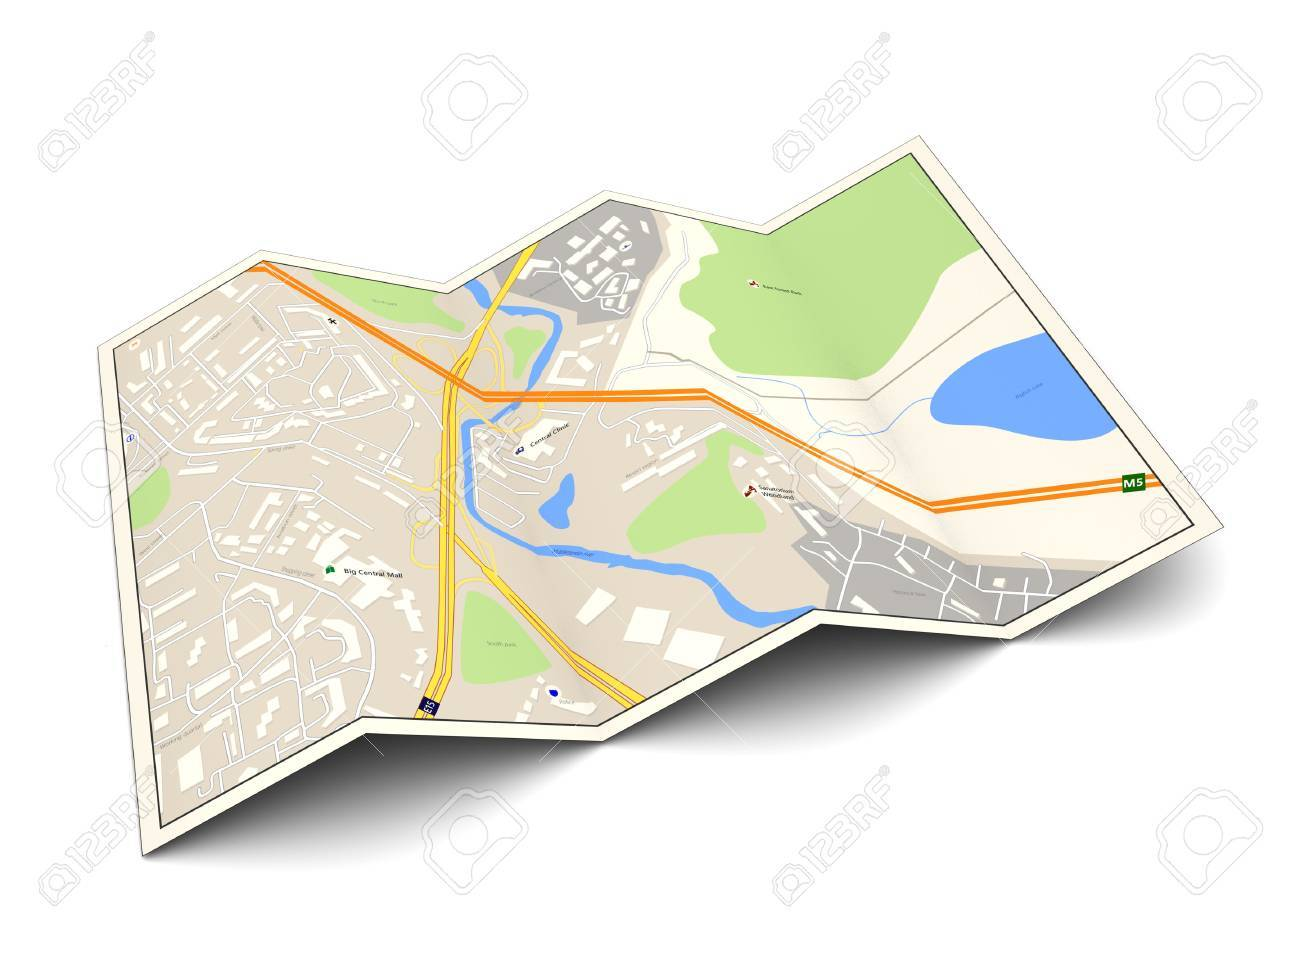 3d illustration of city map over white background - 45524430